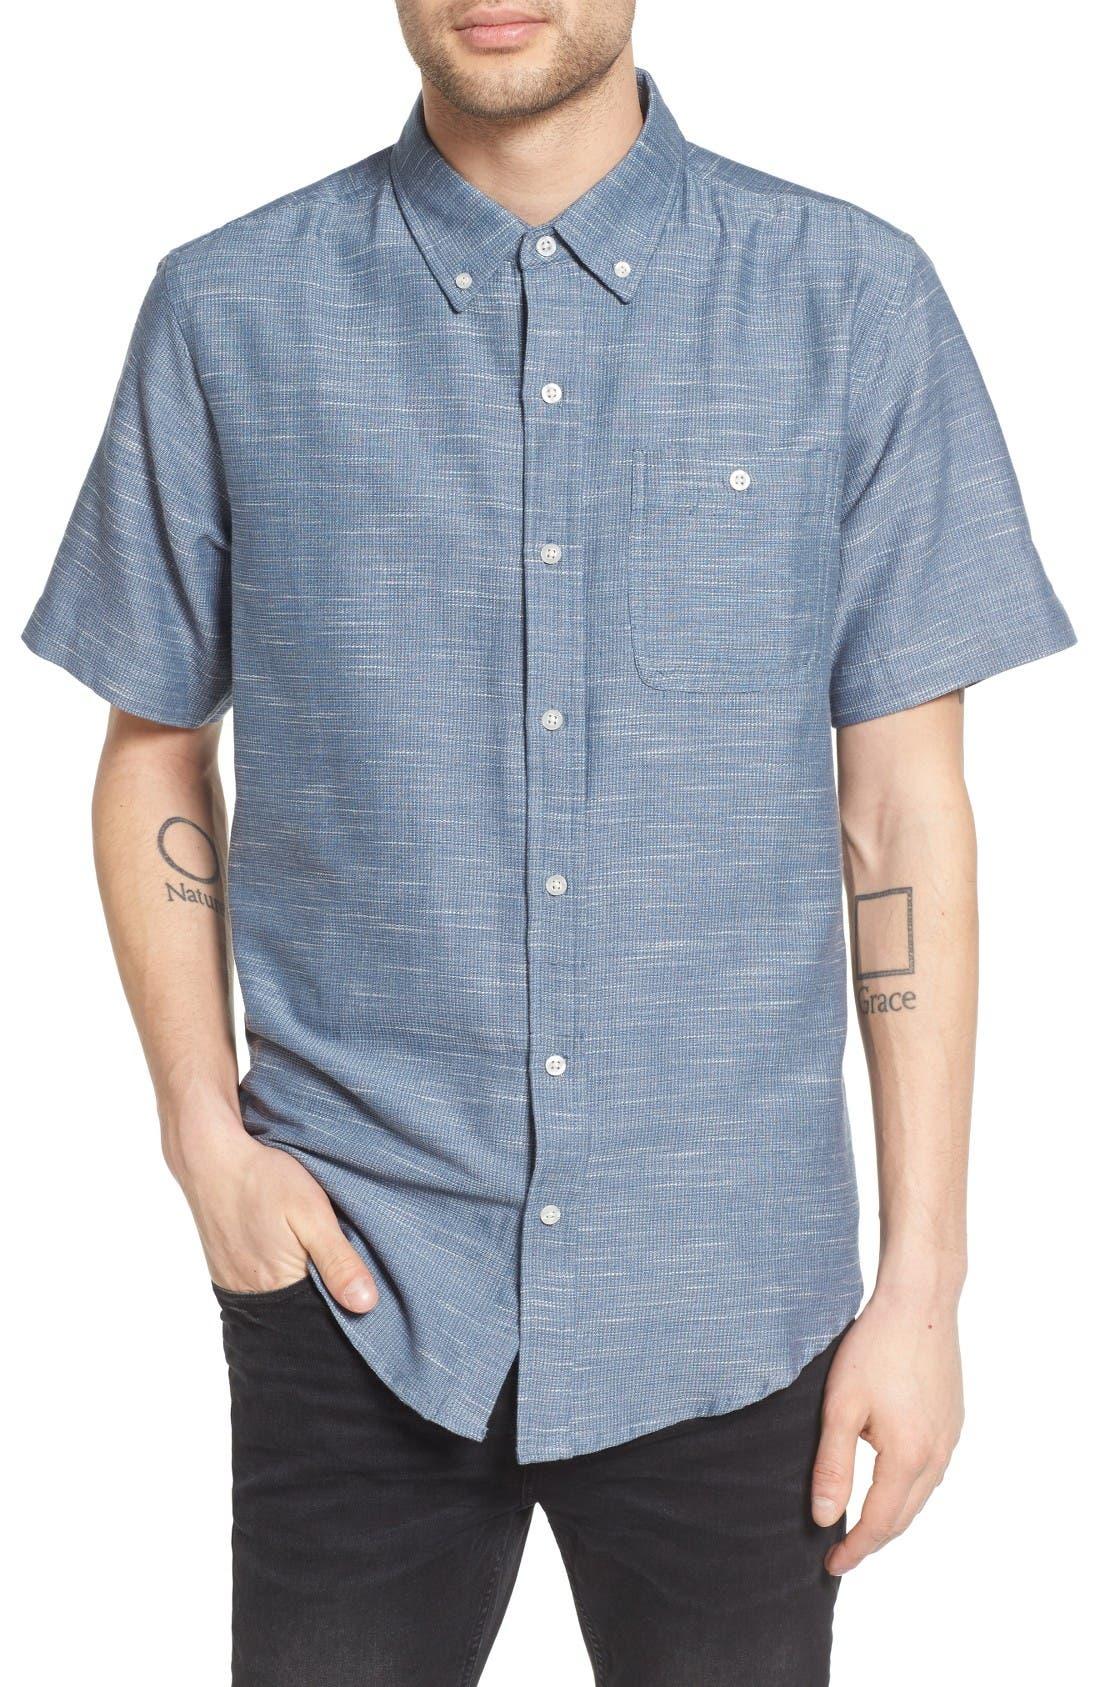 Main Image - Ezekiel Textured Woven Shirt